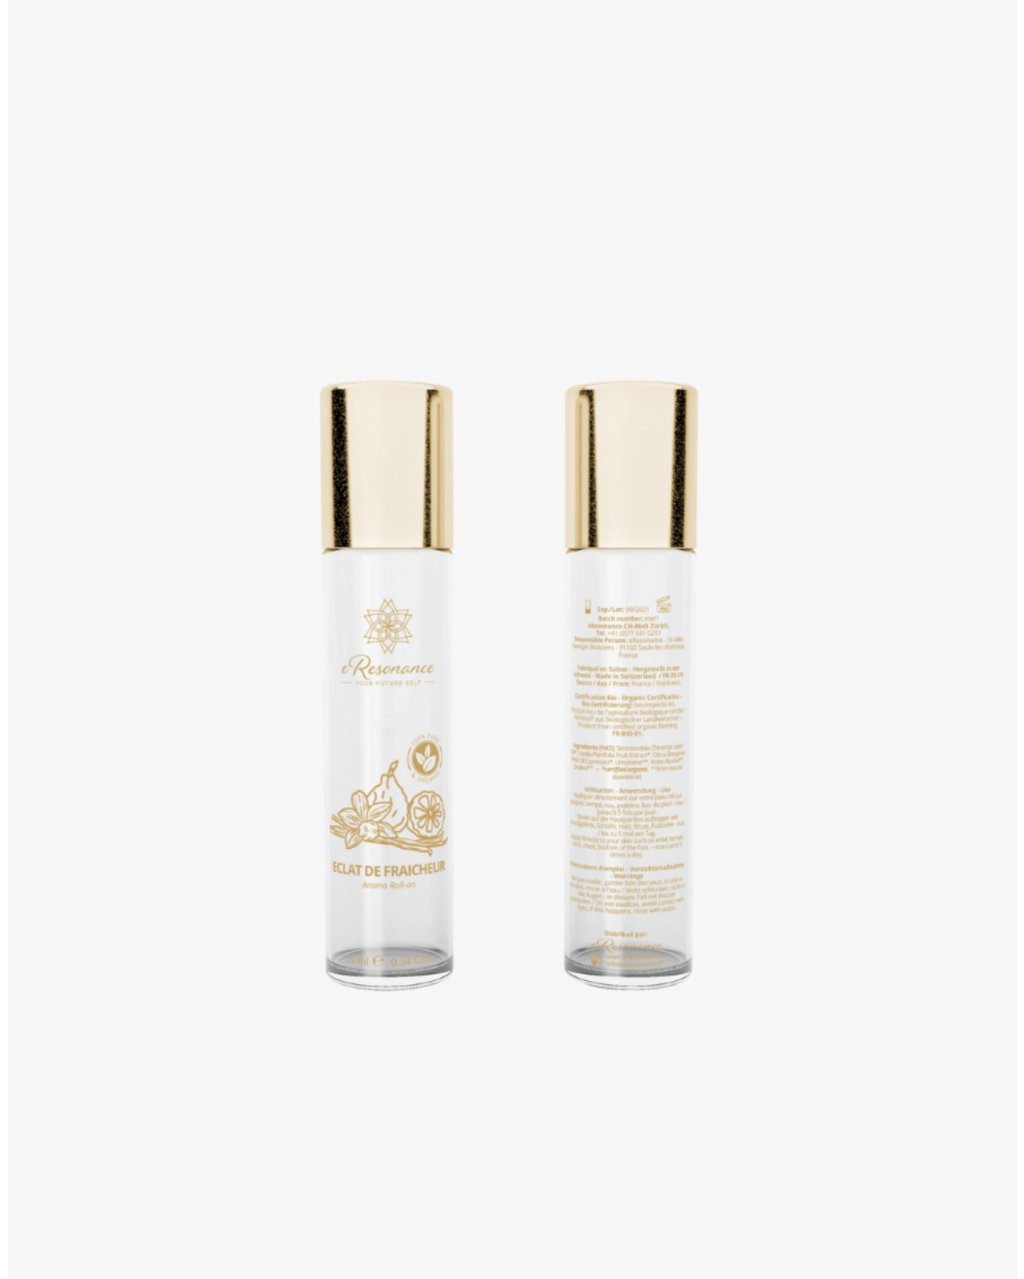 Aroma roll-on podpora vitality a energie